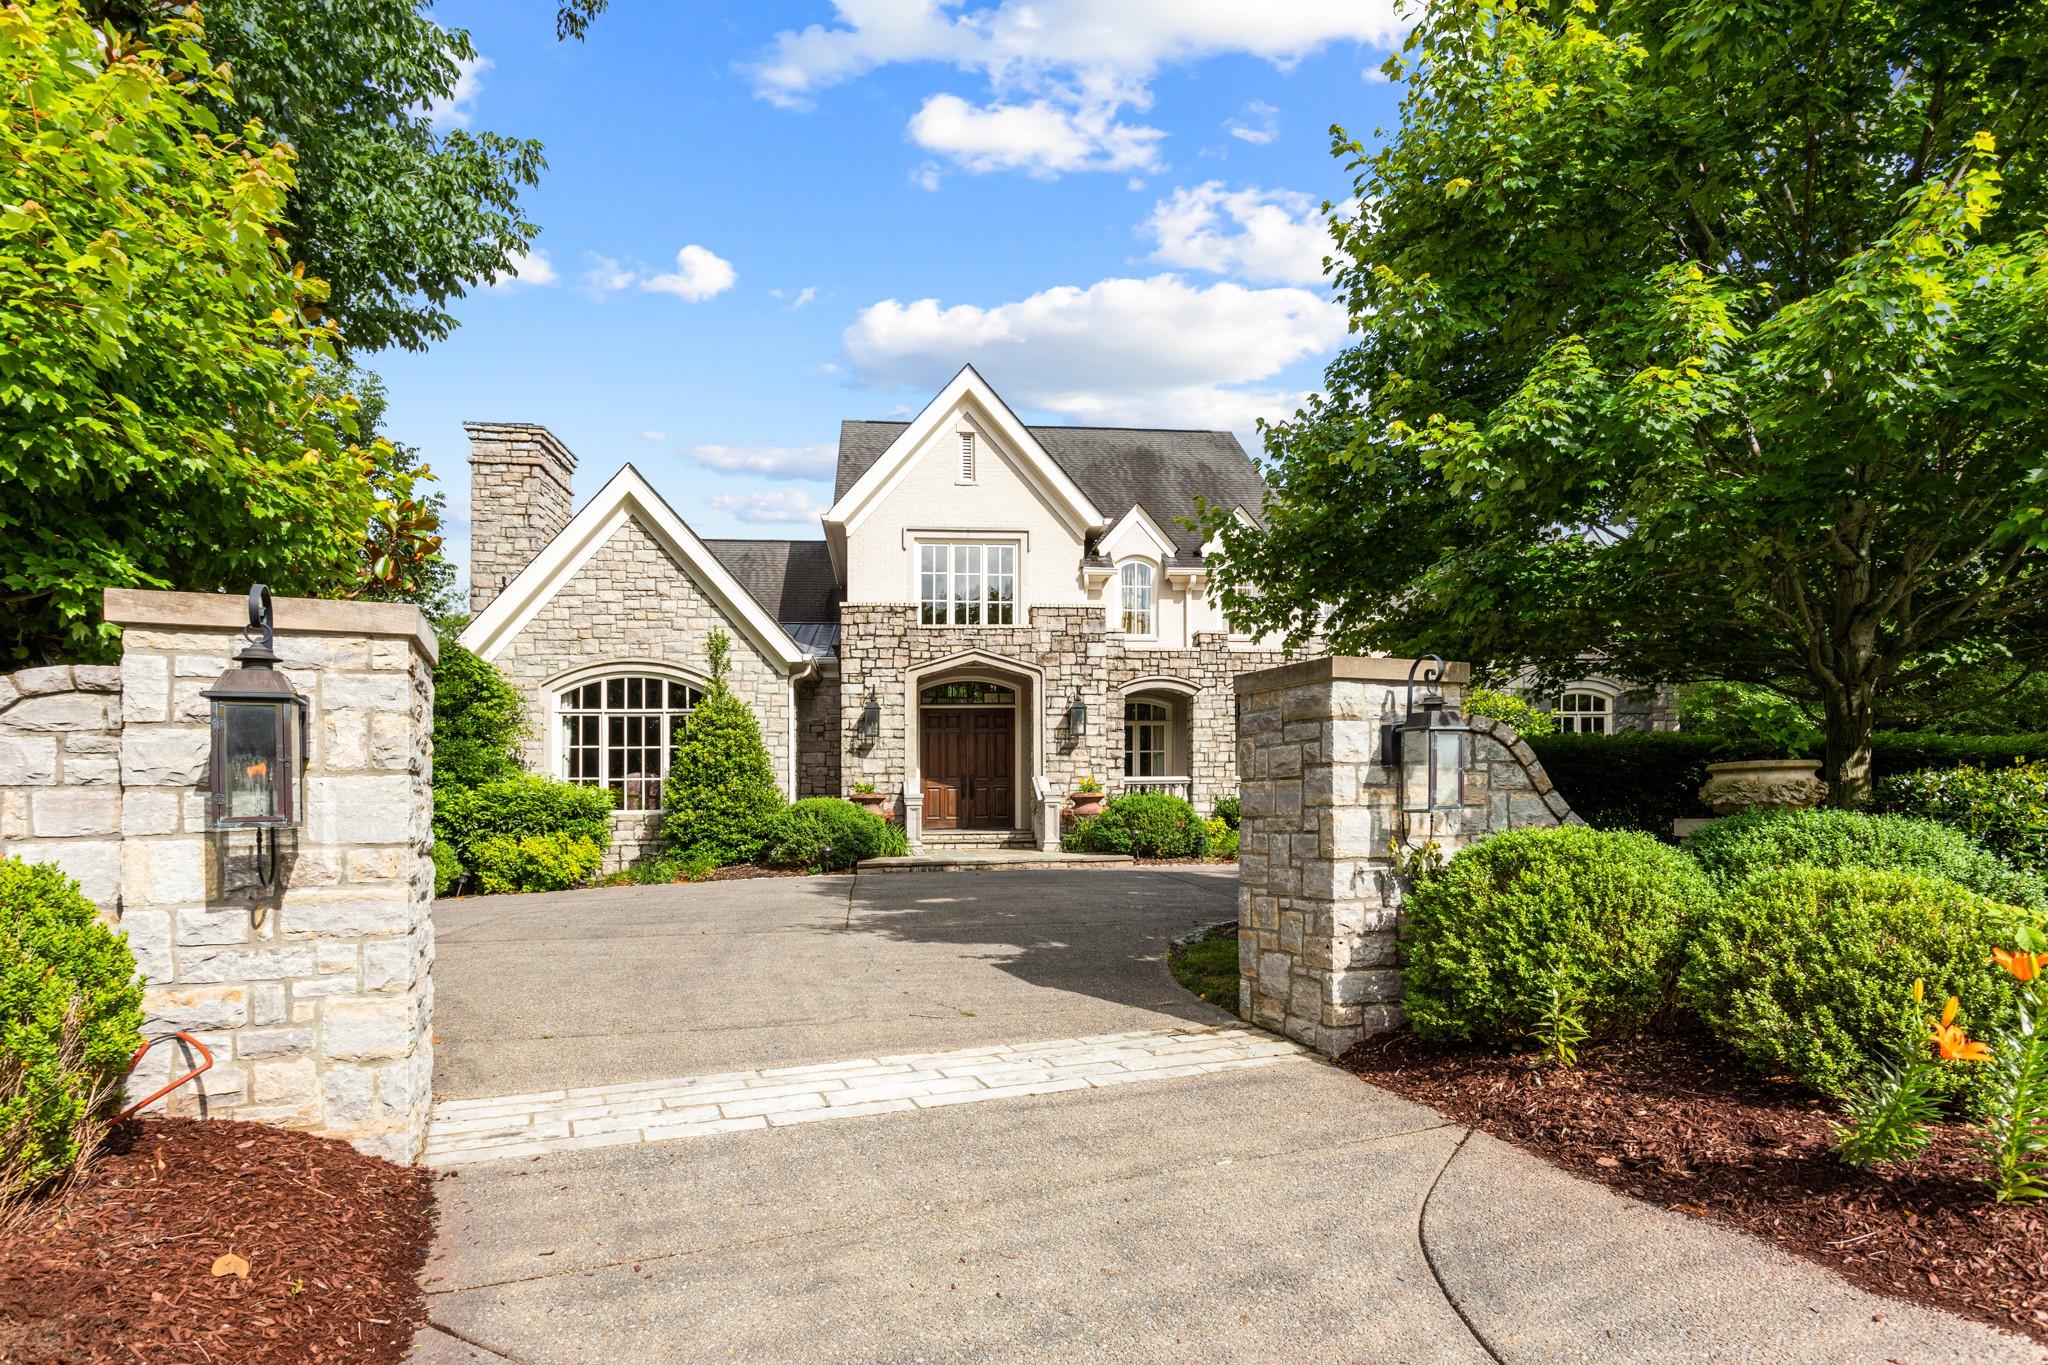 1715 Talbot Trl, Franklin, TN 37069 - Franklin, TN real estate listing